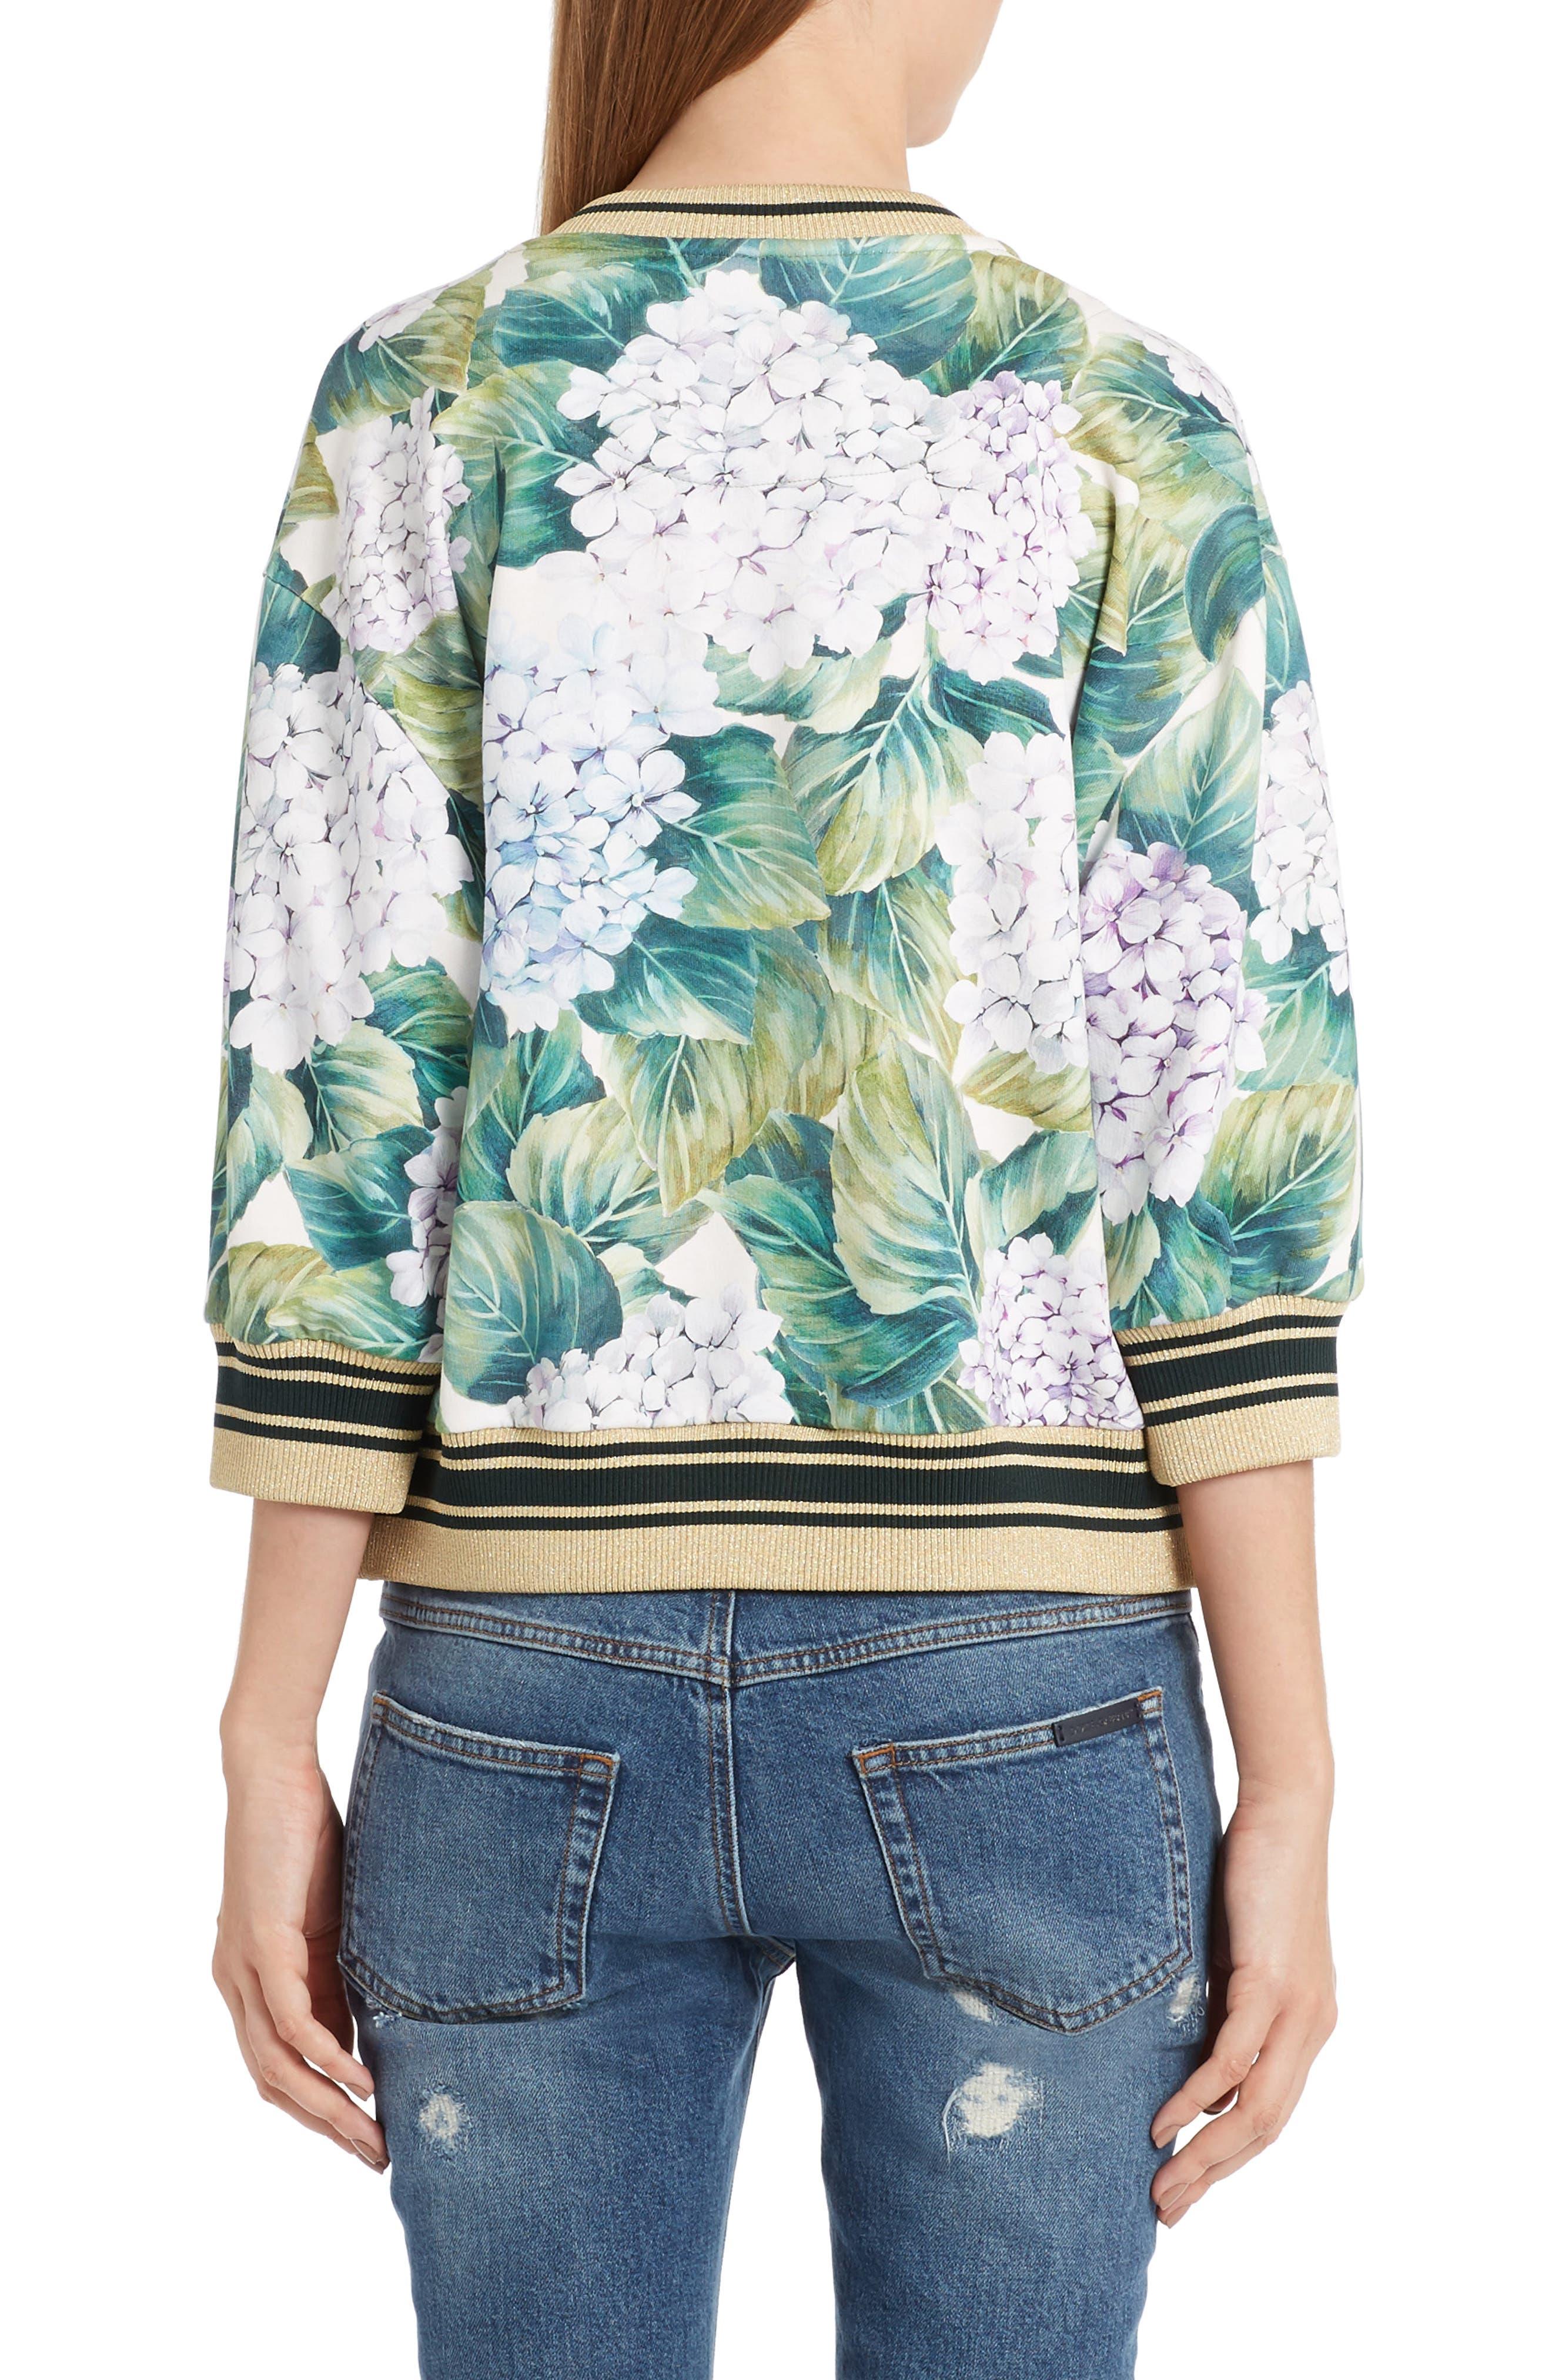 Hydrangea Print Sweatshirt,                             Alternate thumbnail 2, color,                             301